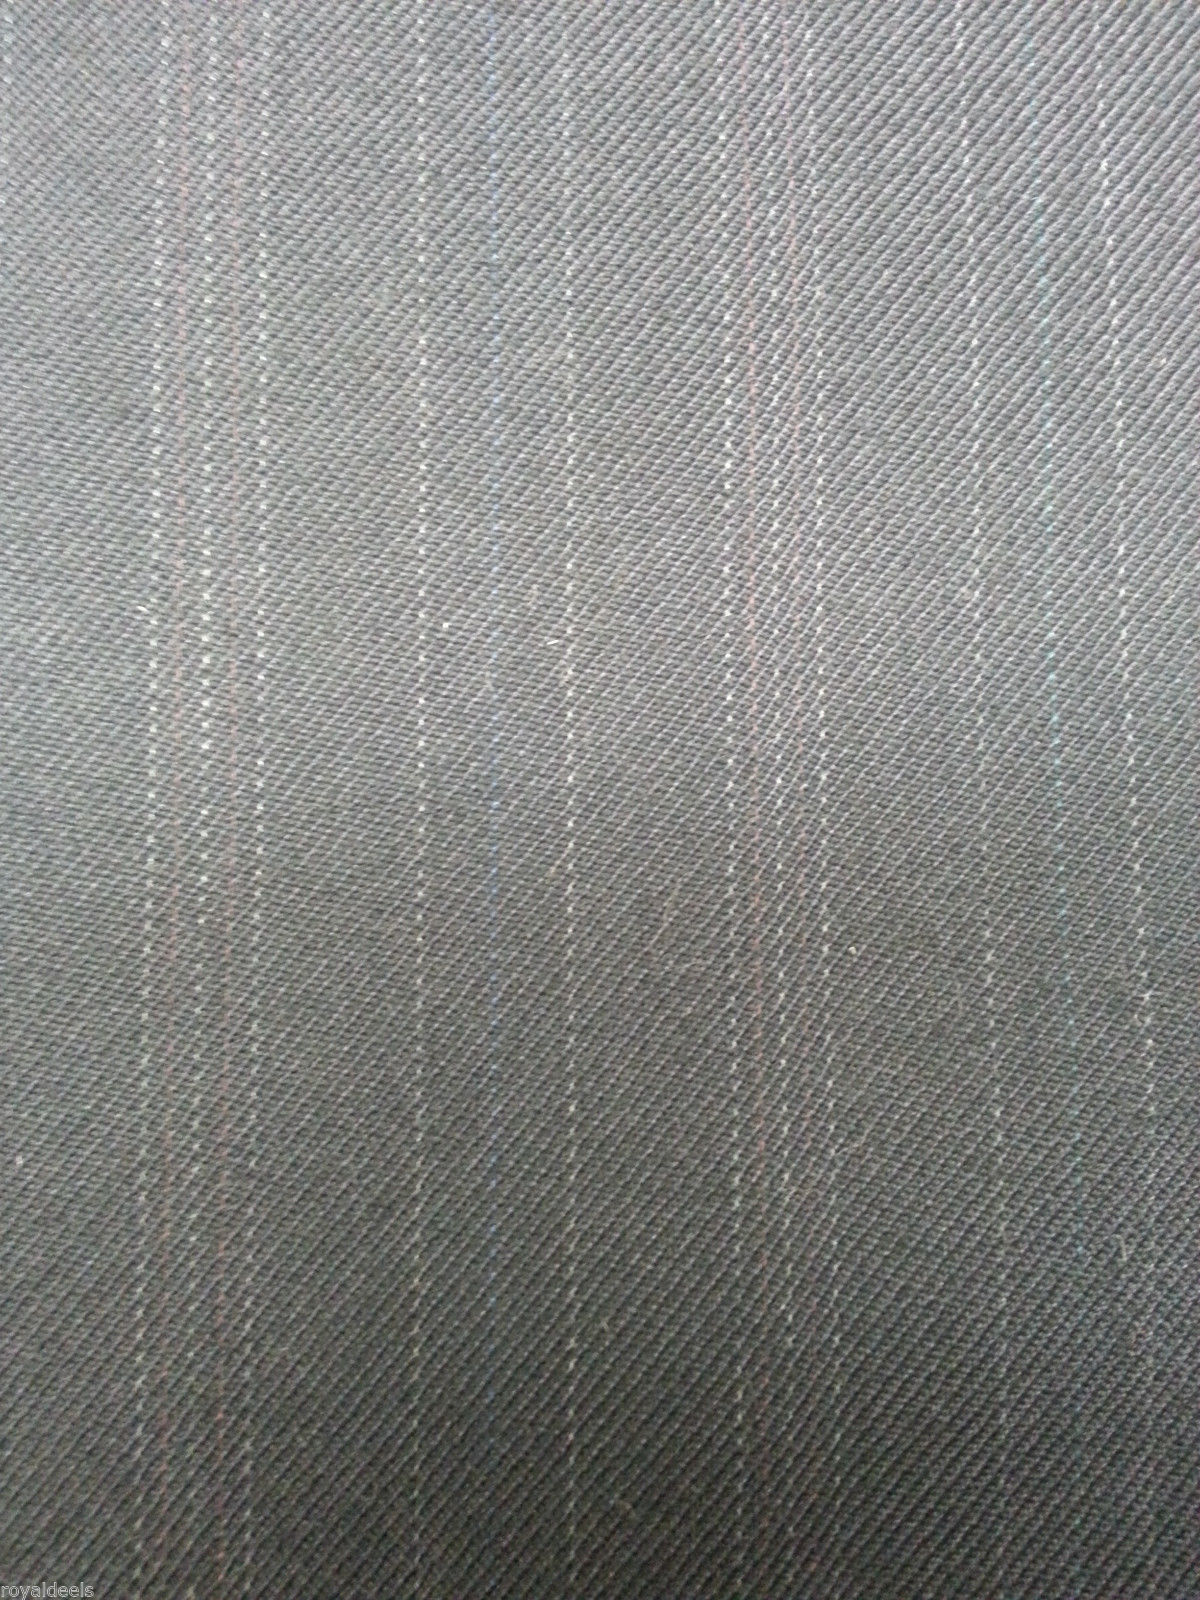 7 YRD  BLUE ENGLISH WOOL Pin Stripe Suit Skirt Jacket Fashion Sewing Fabric